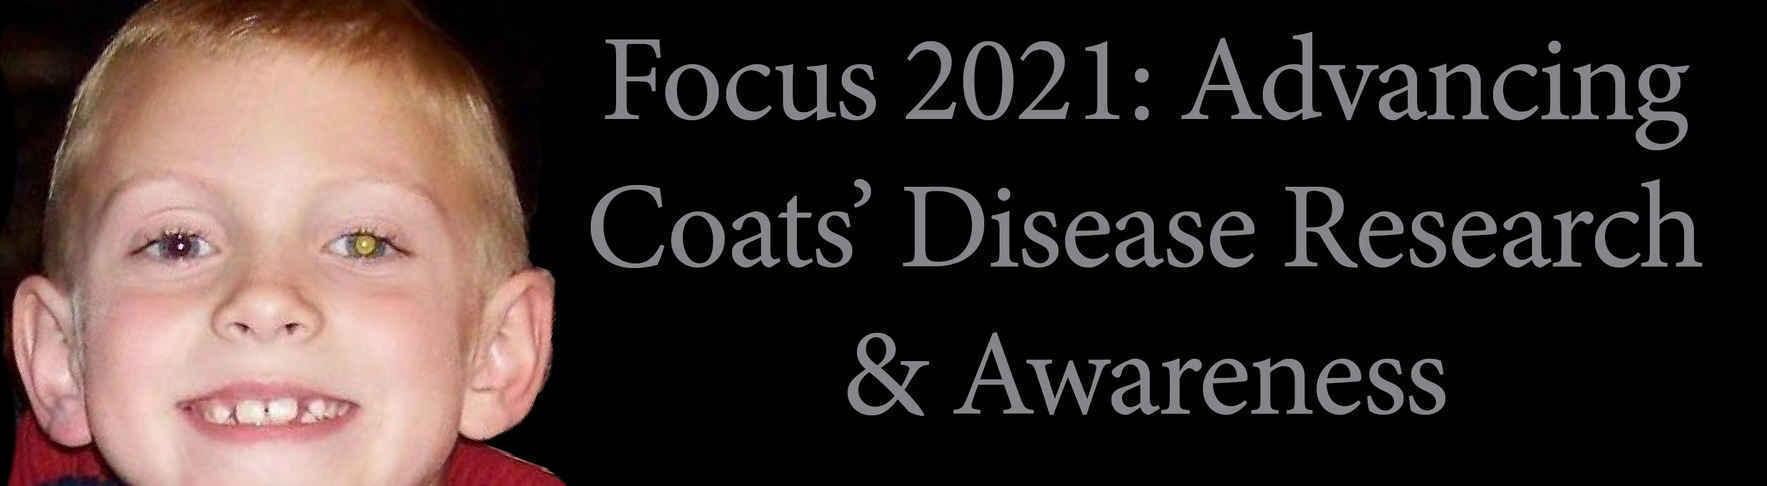 Focus 2021: Advancing Coats' Disease Research & Awareness image